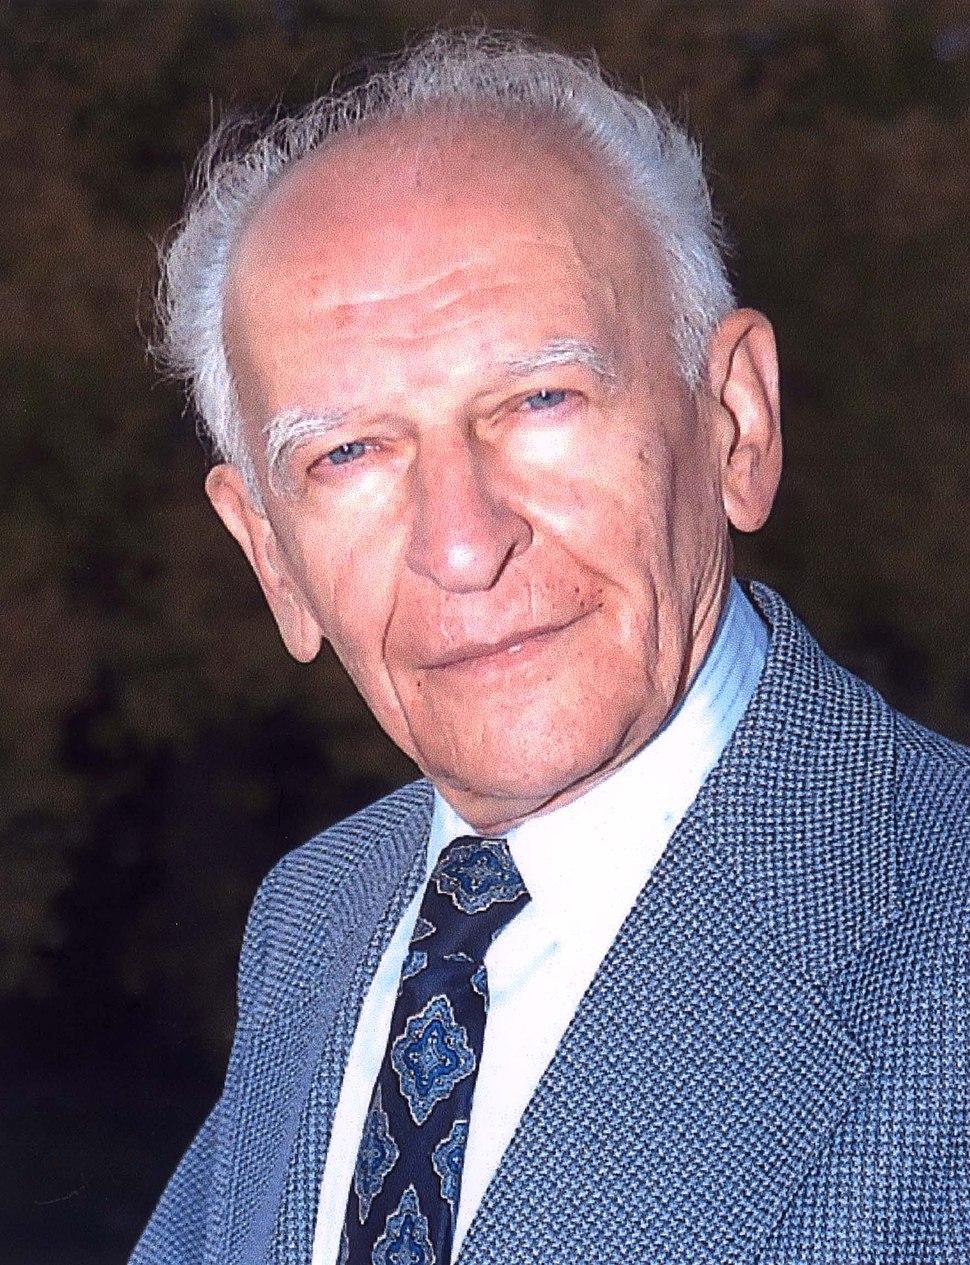 Tibor Baranski